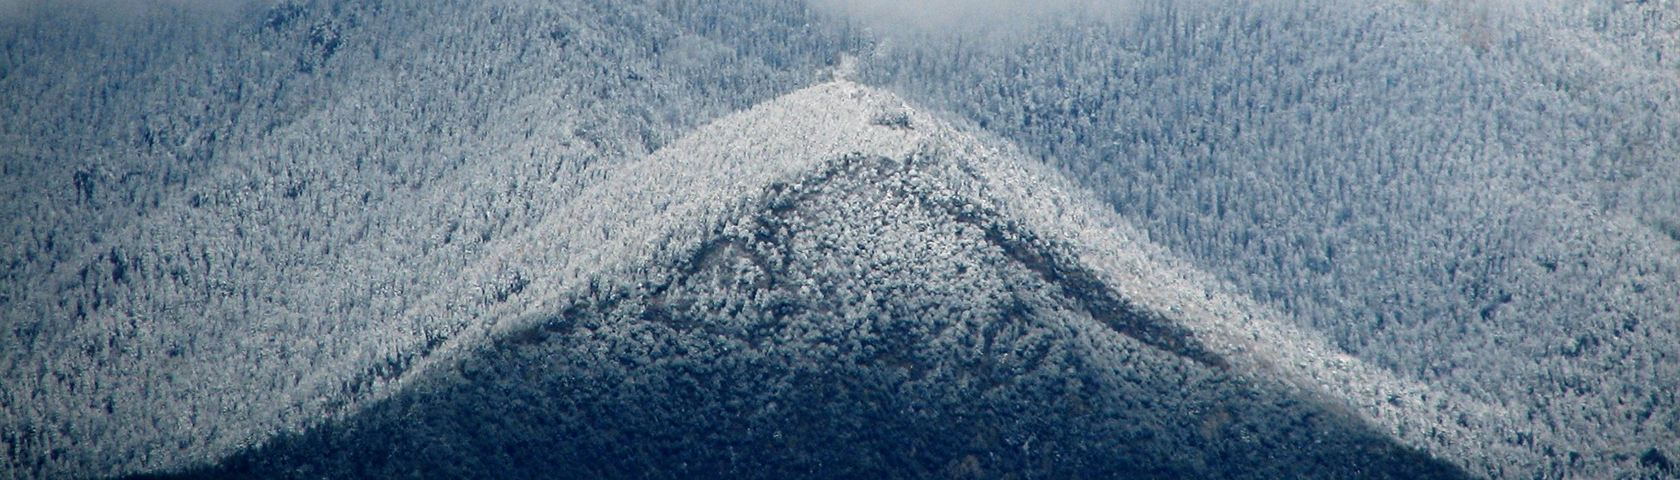 Mountain in Taos Pueblo, NM